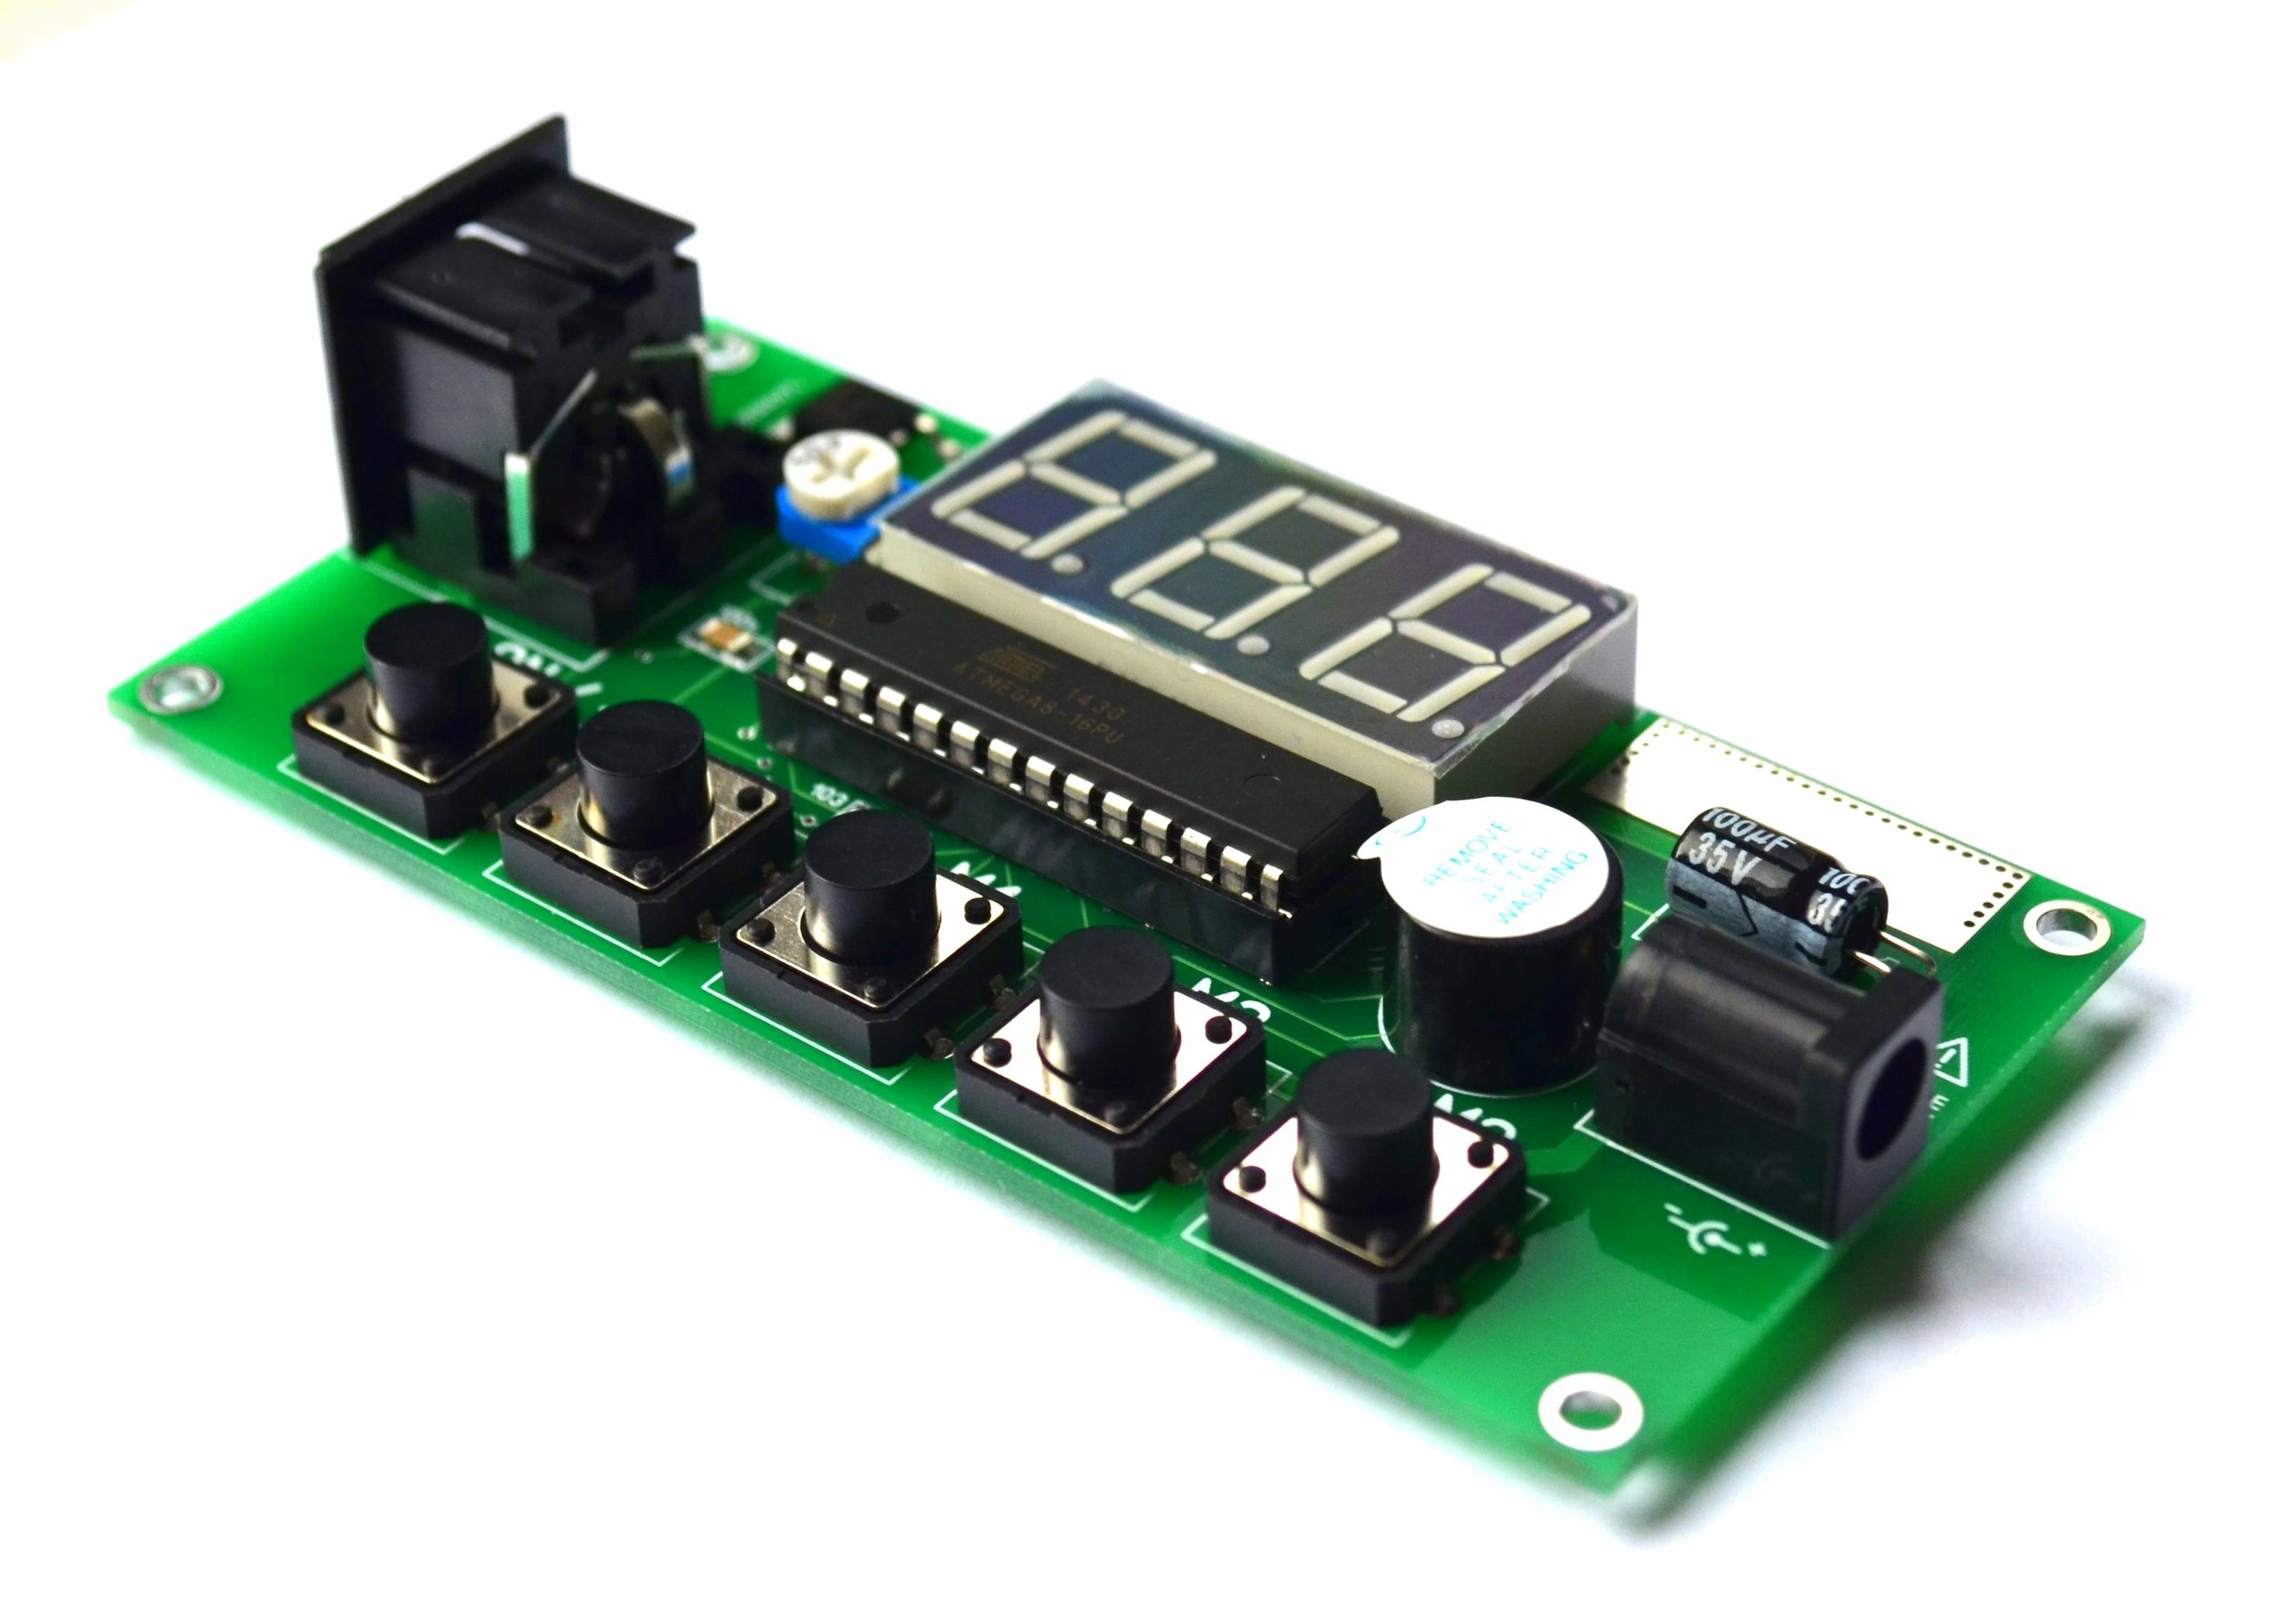 digital soldering iron controller hakko 907 esd from bugrovs2012 on tindie. Black Bedroom Furniture Sets. Home Design Ideas